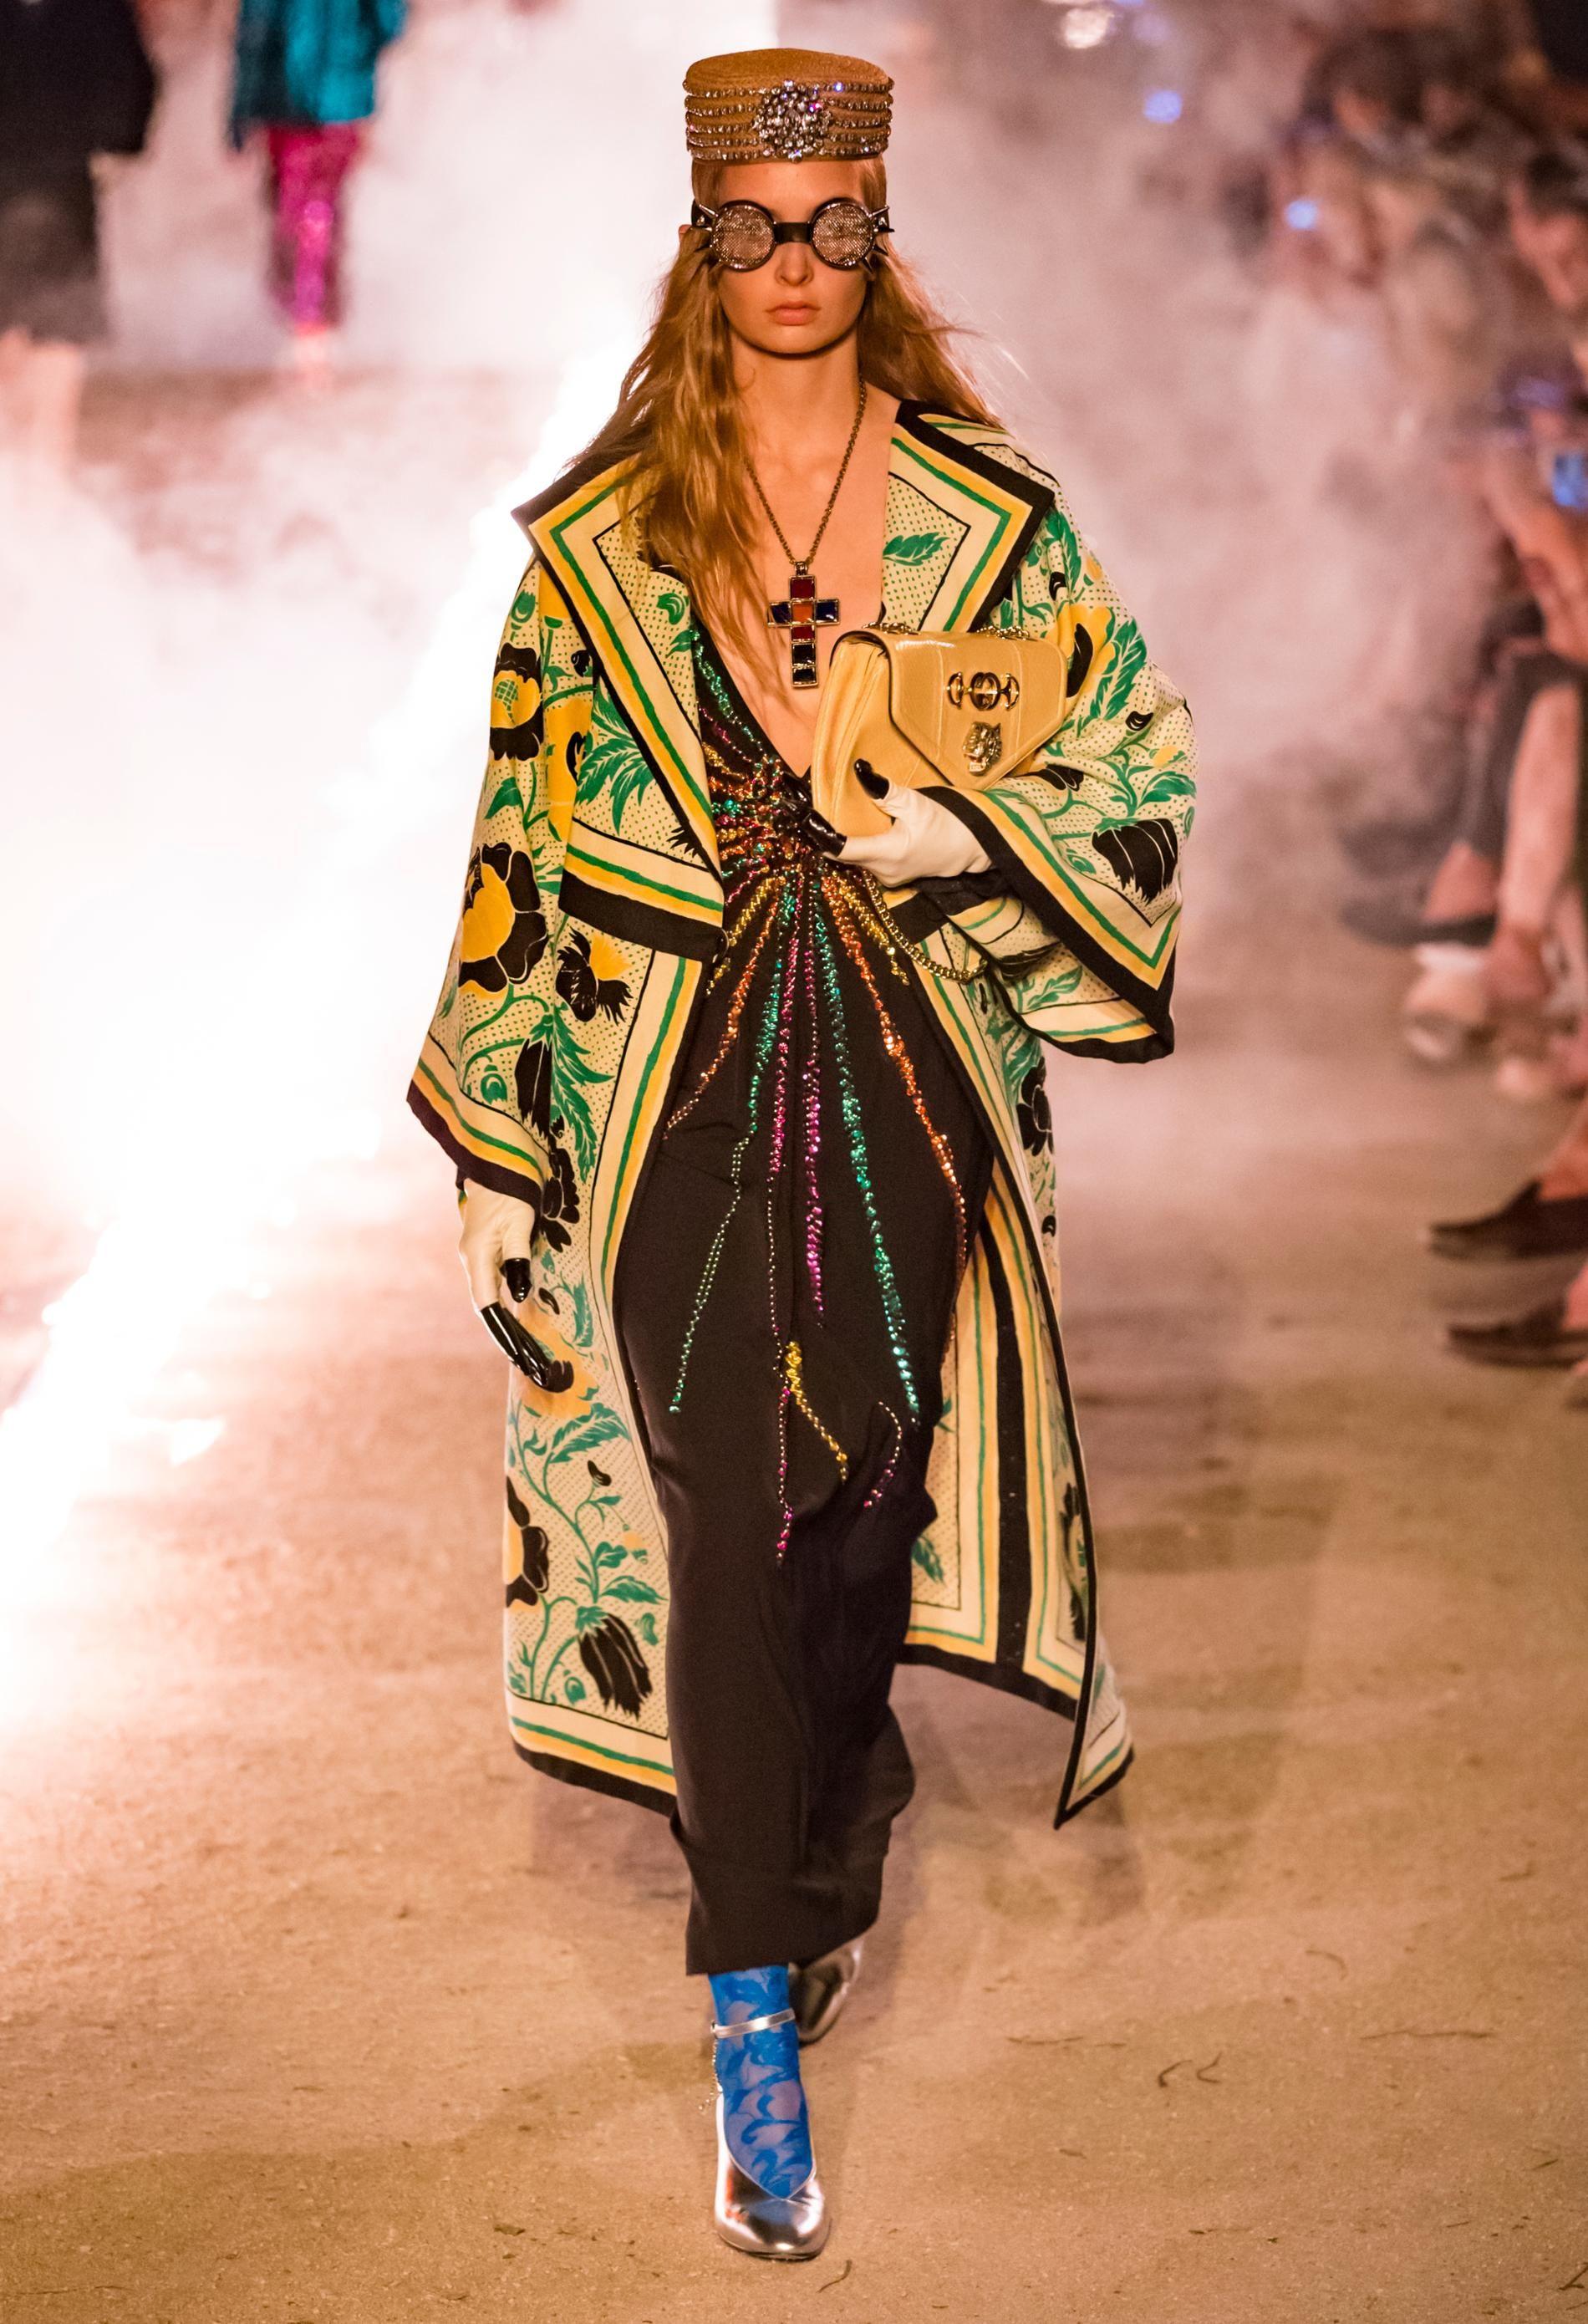 Défilé Gucci 2019 Croisière - Madame Figaro 20441e3c481f